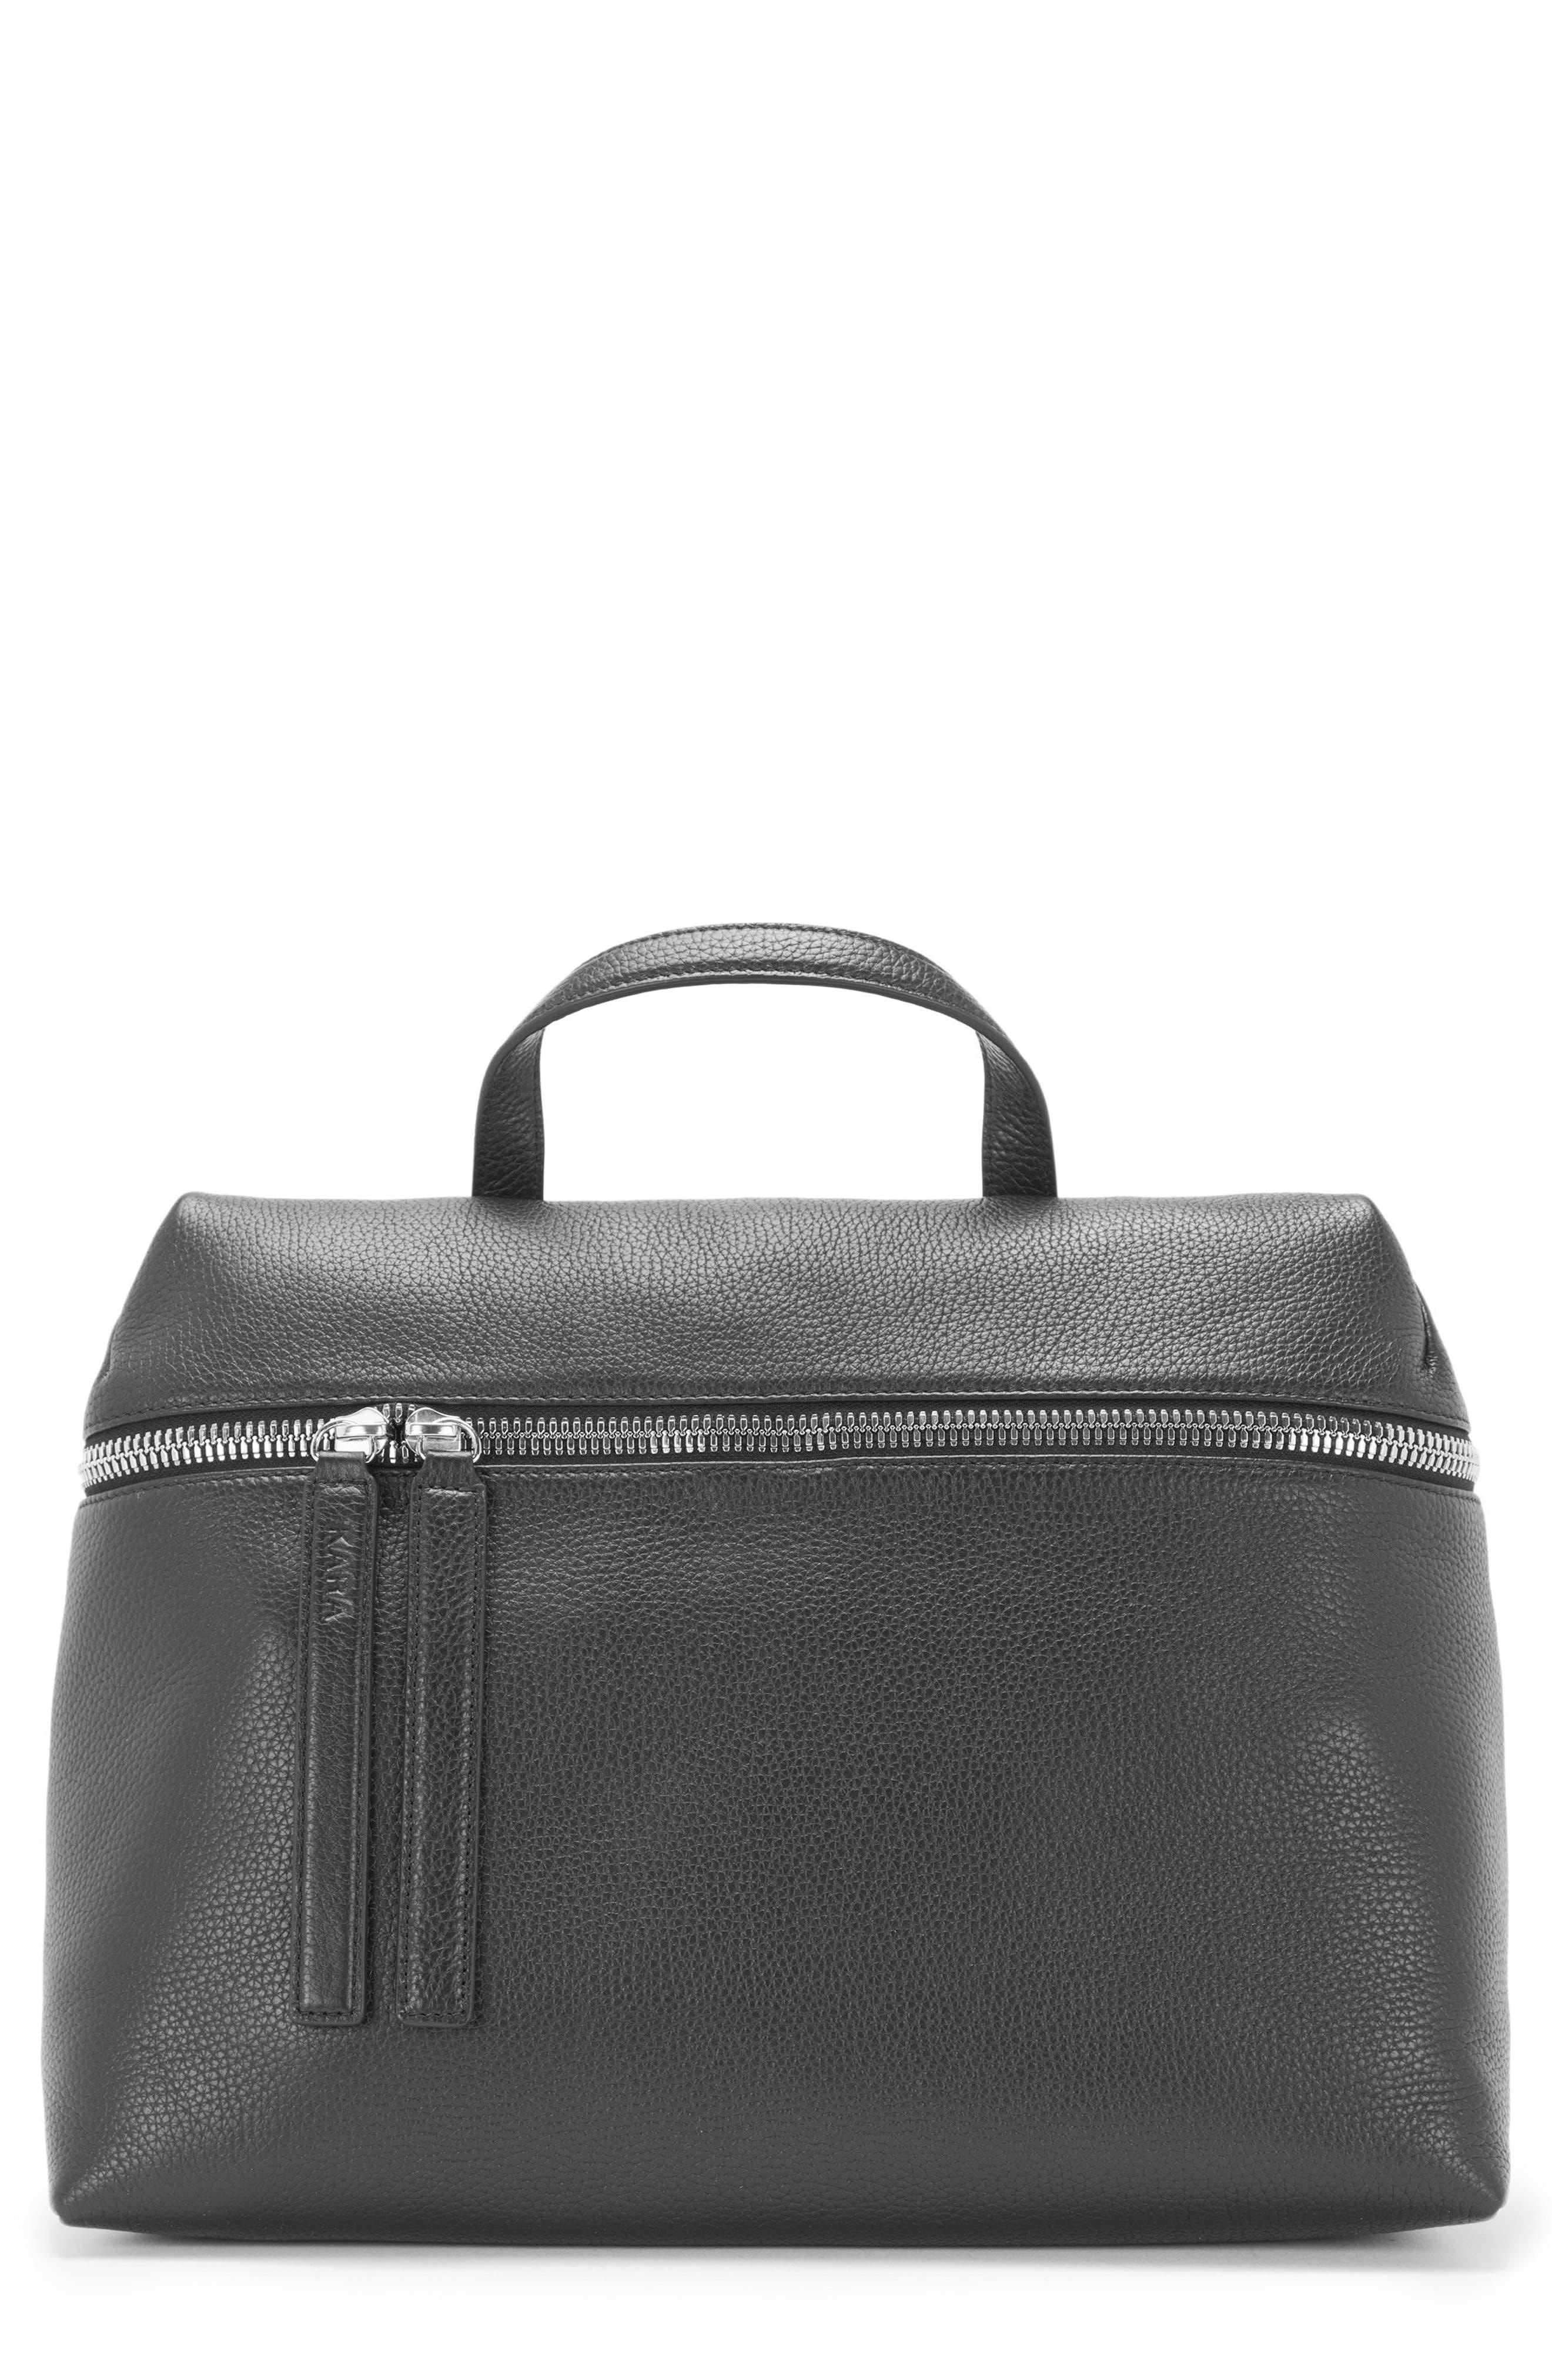 Pebbled Leather Satchel, Main, color, 001